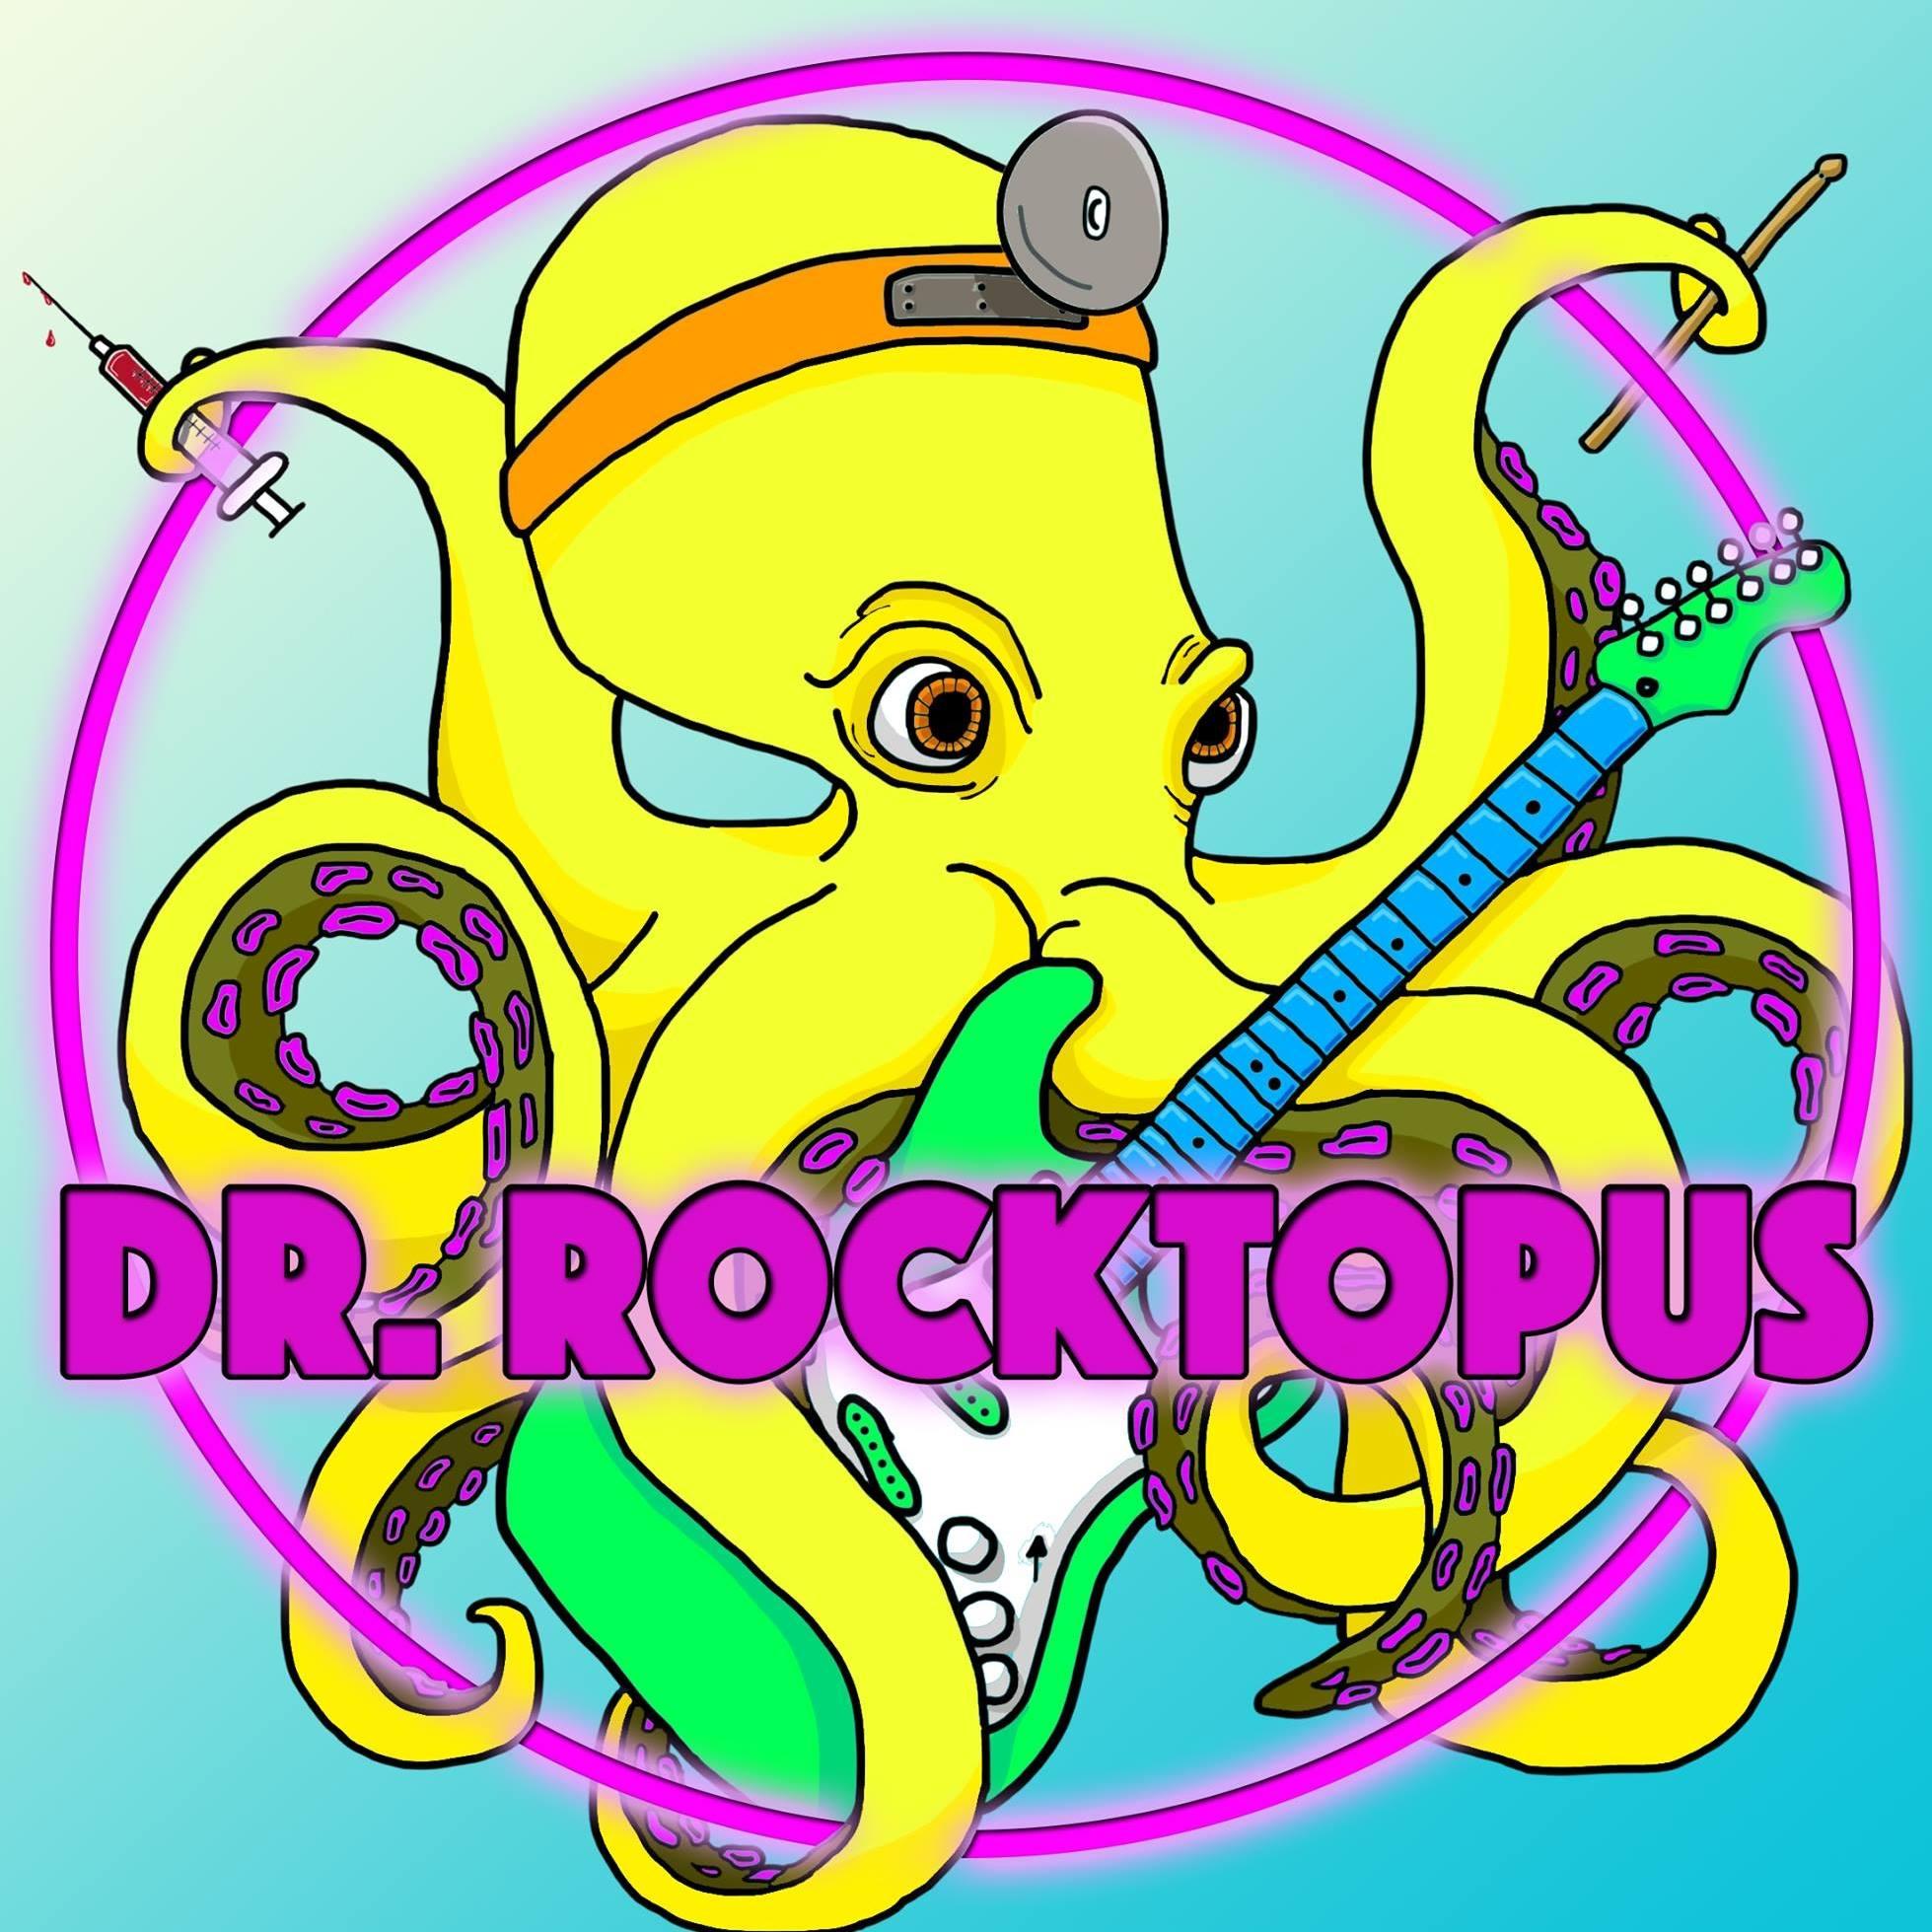 rocktopus.jpg